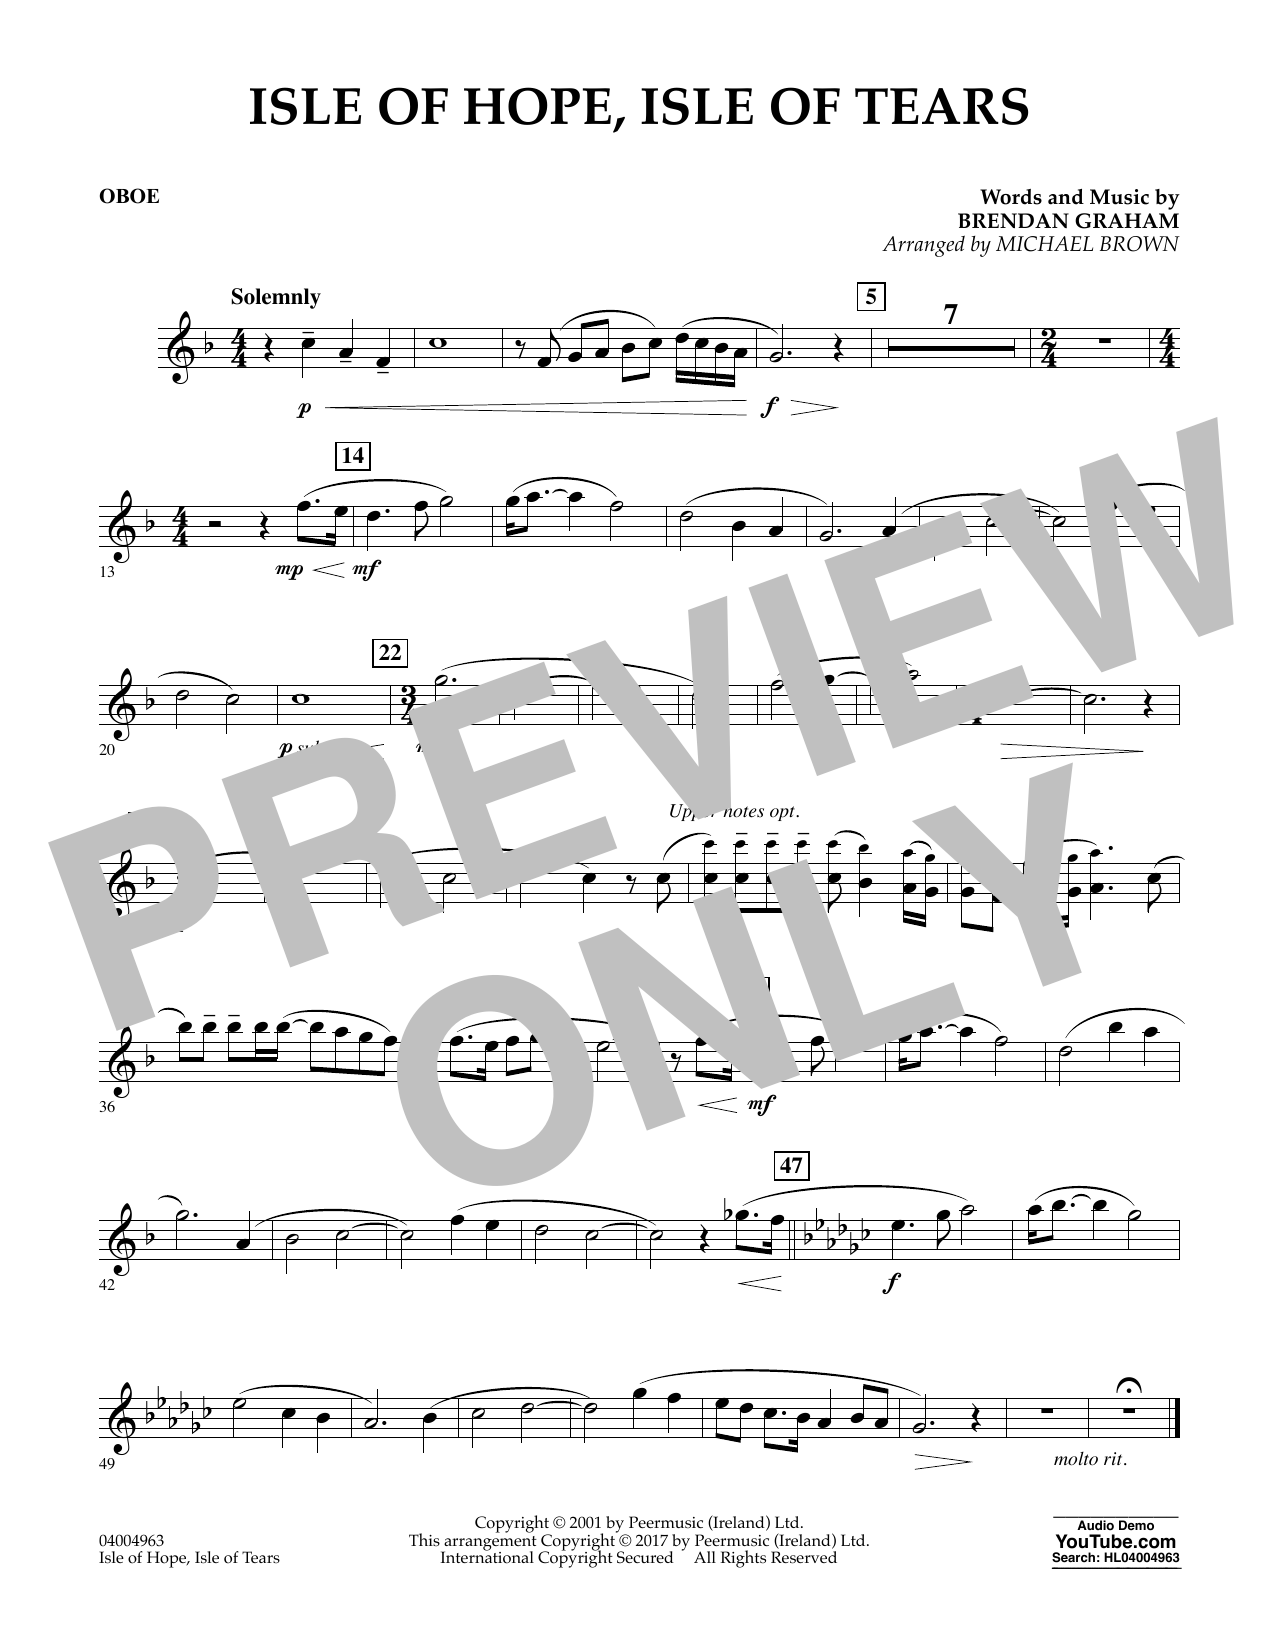 Isle of Hope, Isle of Tears - Oboe Sheet Music